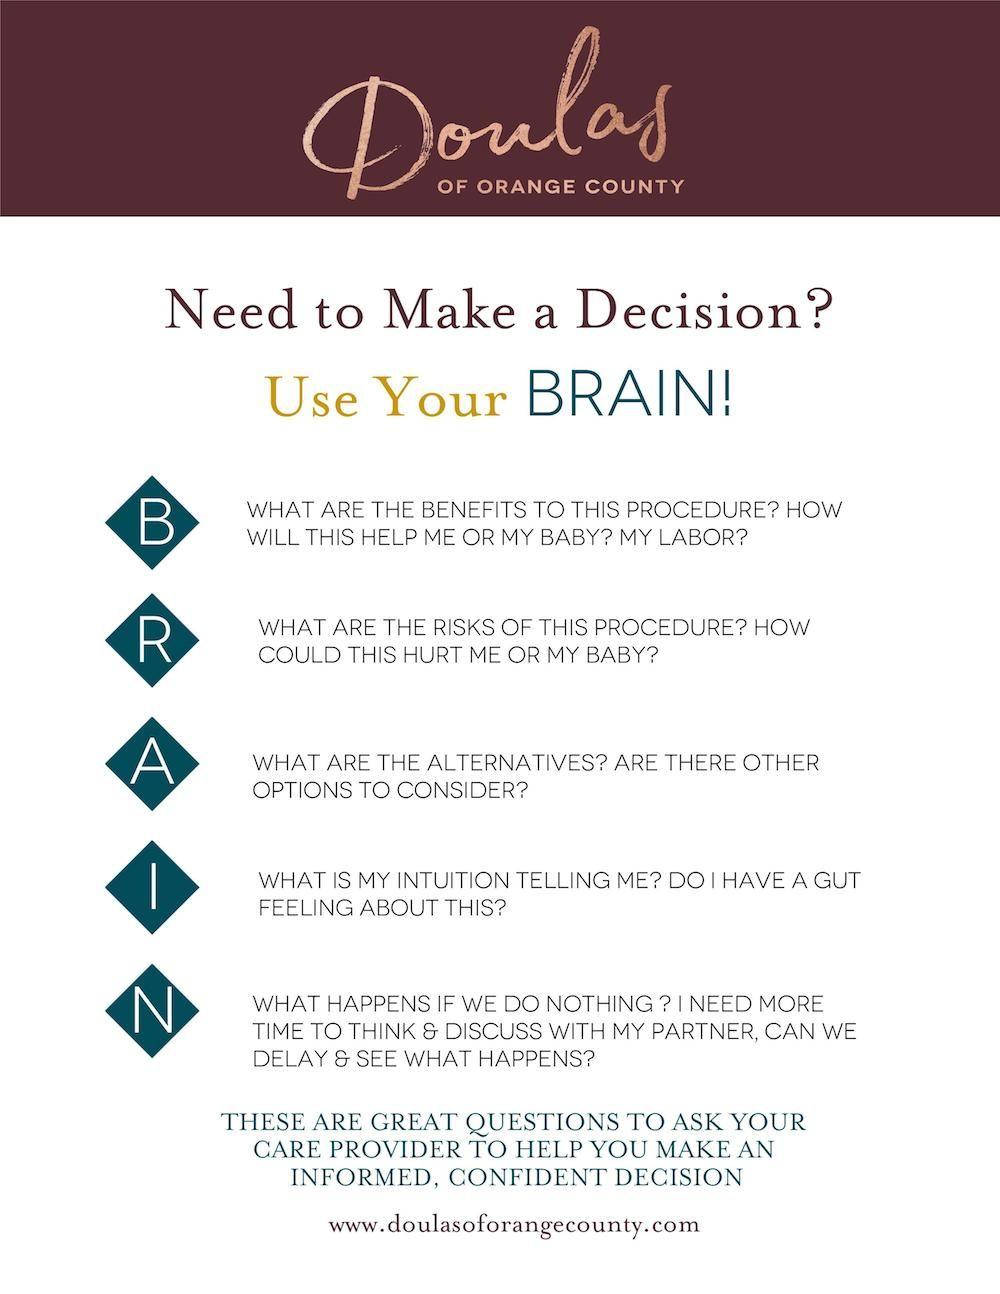 Decision Making & Using Your BRAIN Newborn care